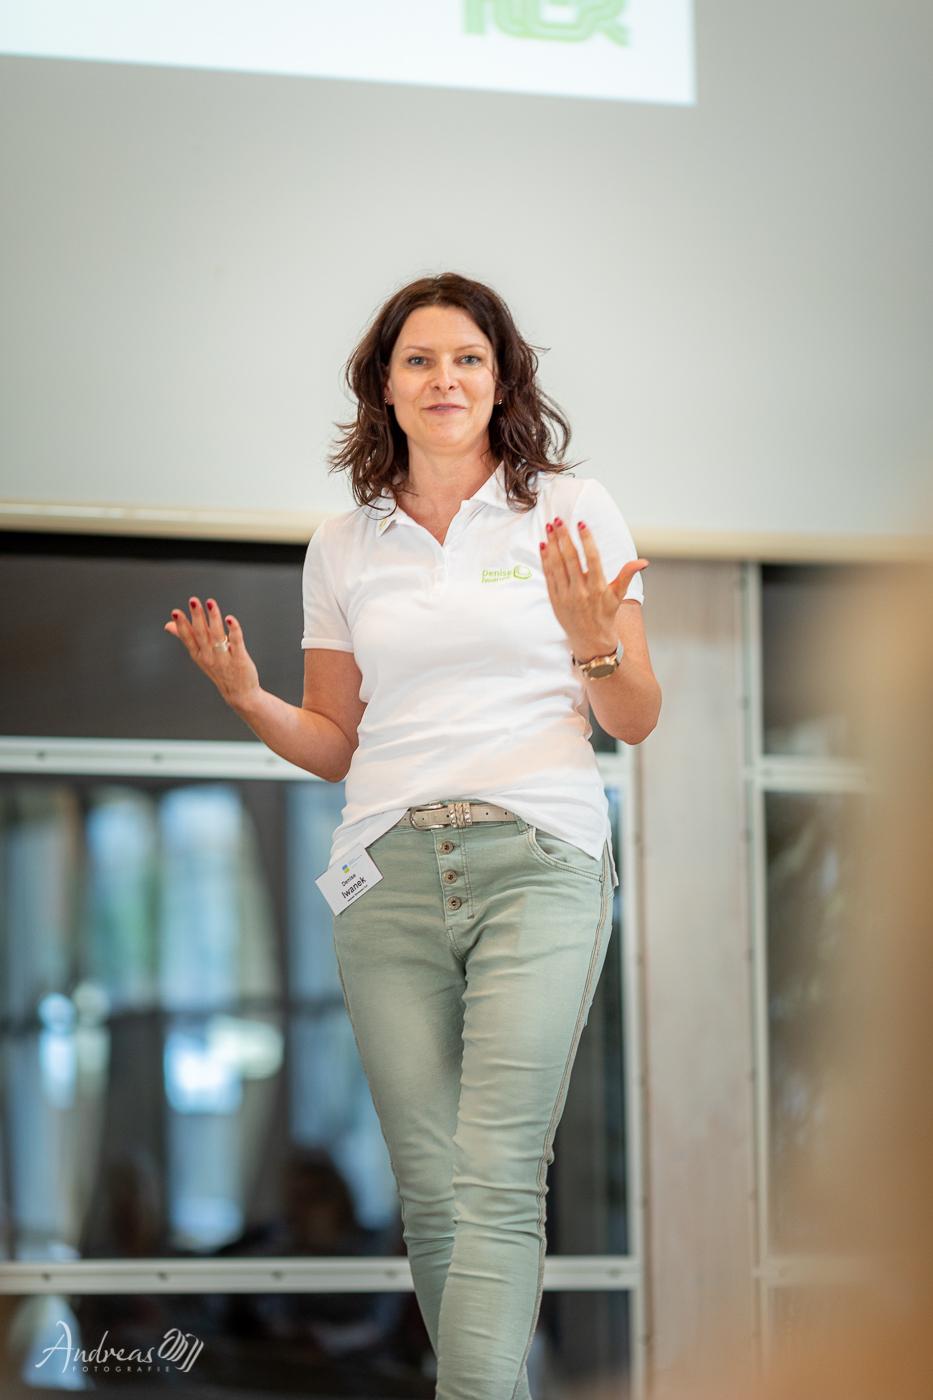 Expert Marketplace -  Denise Iwanek - Impressionen zwei